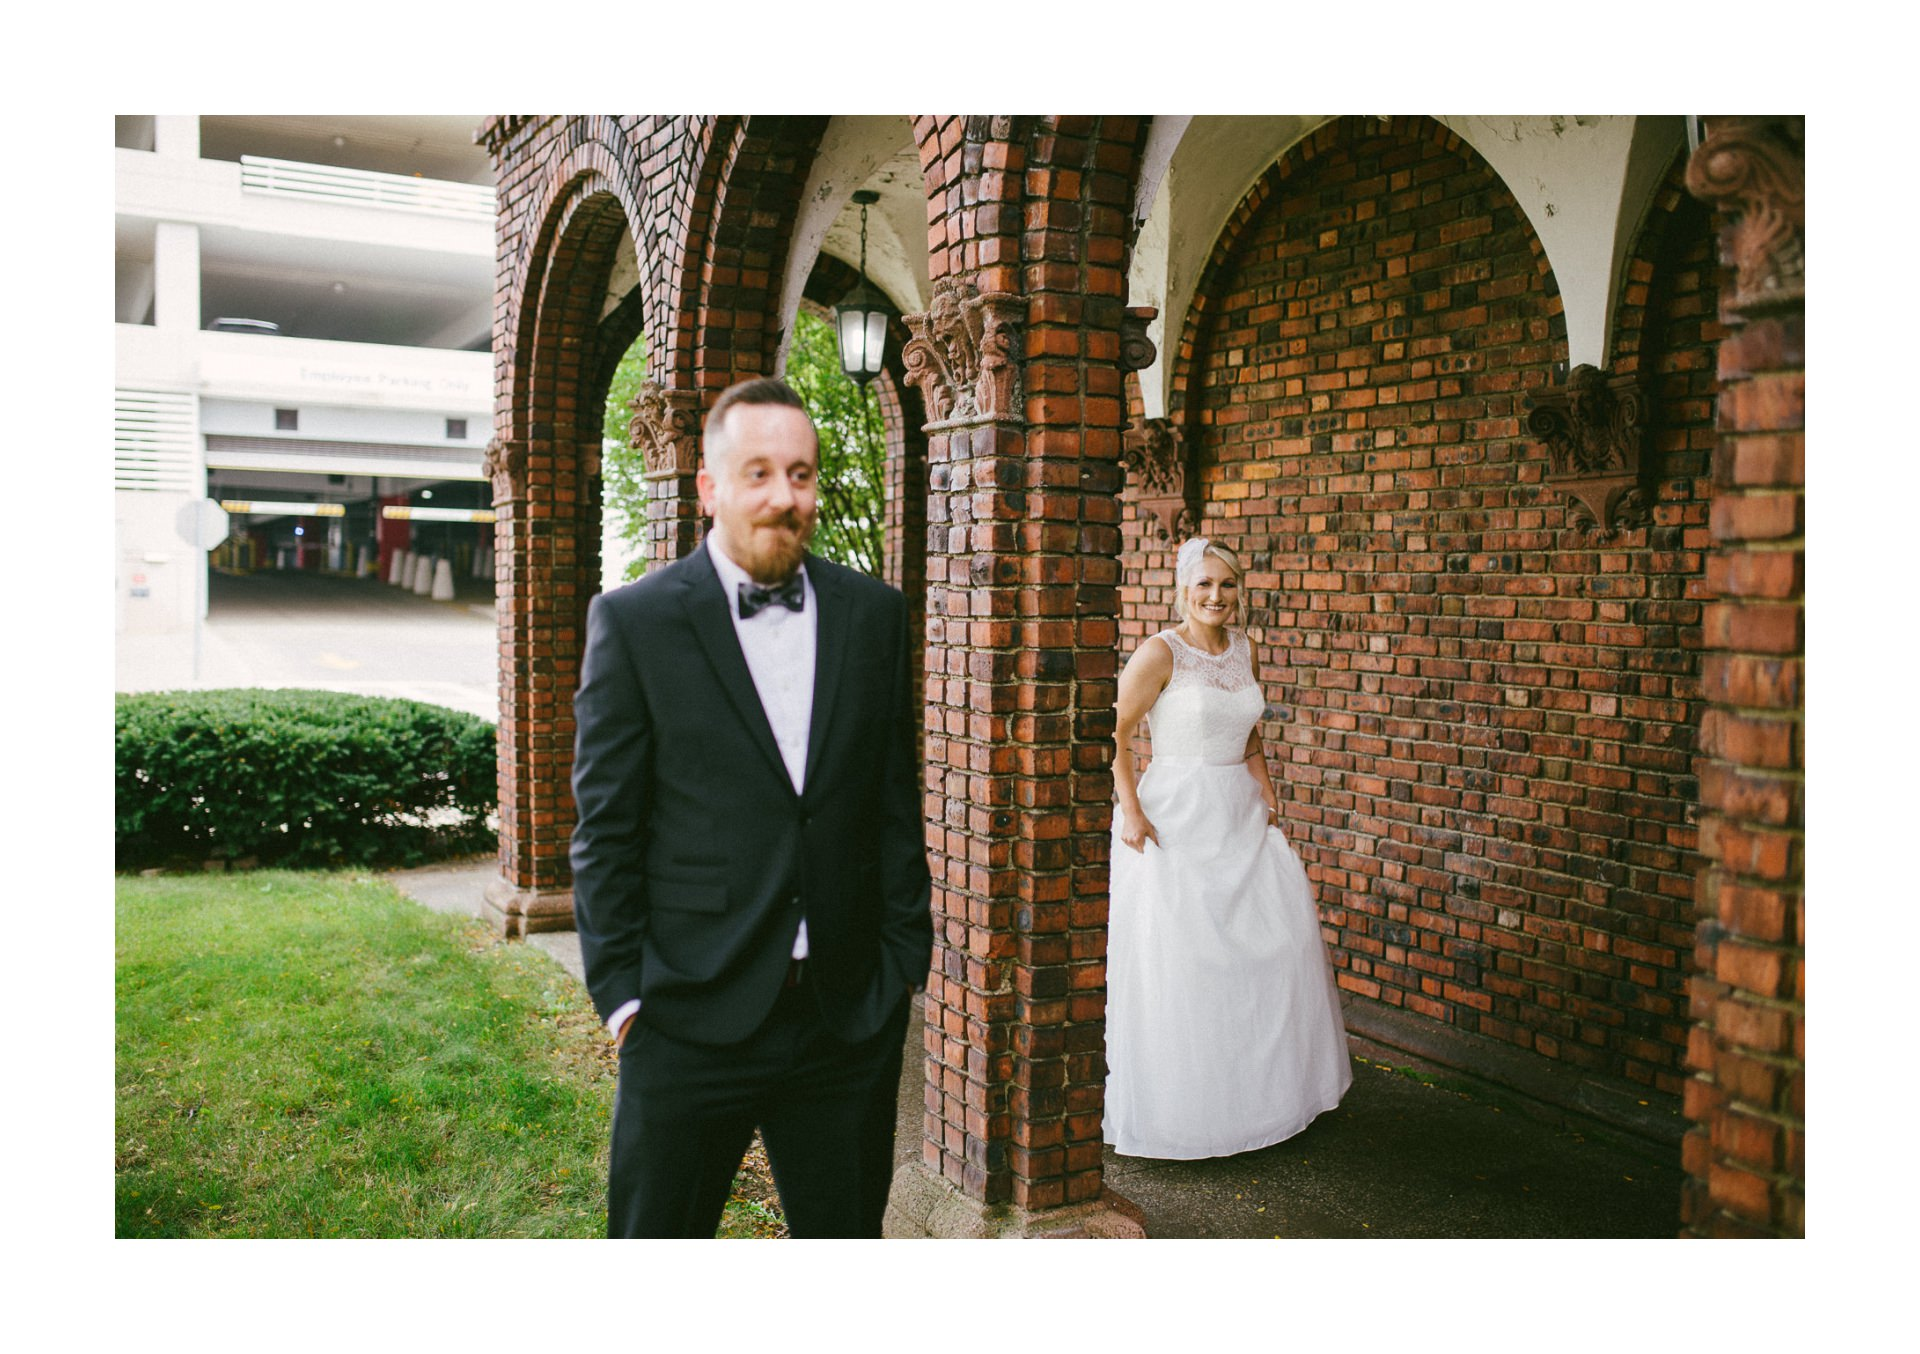 Goldhorn Brewery Wedding Photos in Cleveland 1 26.jpg